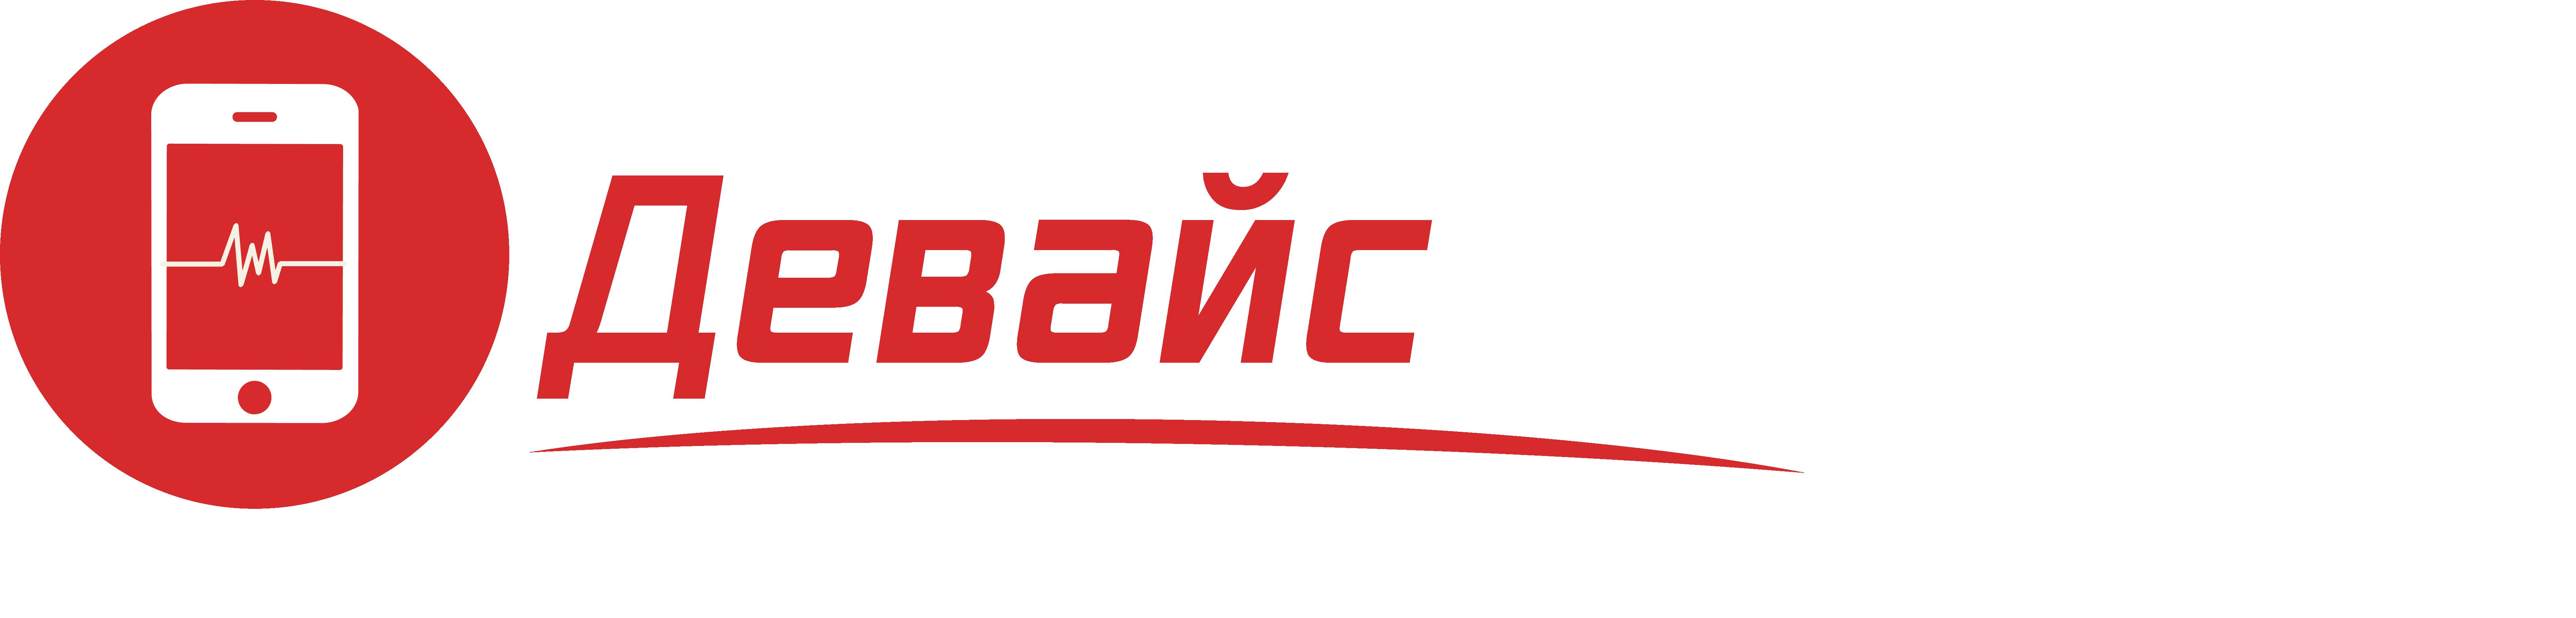 LogoDevice